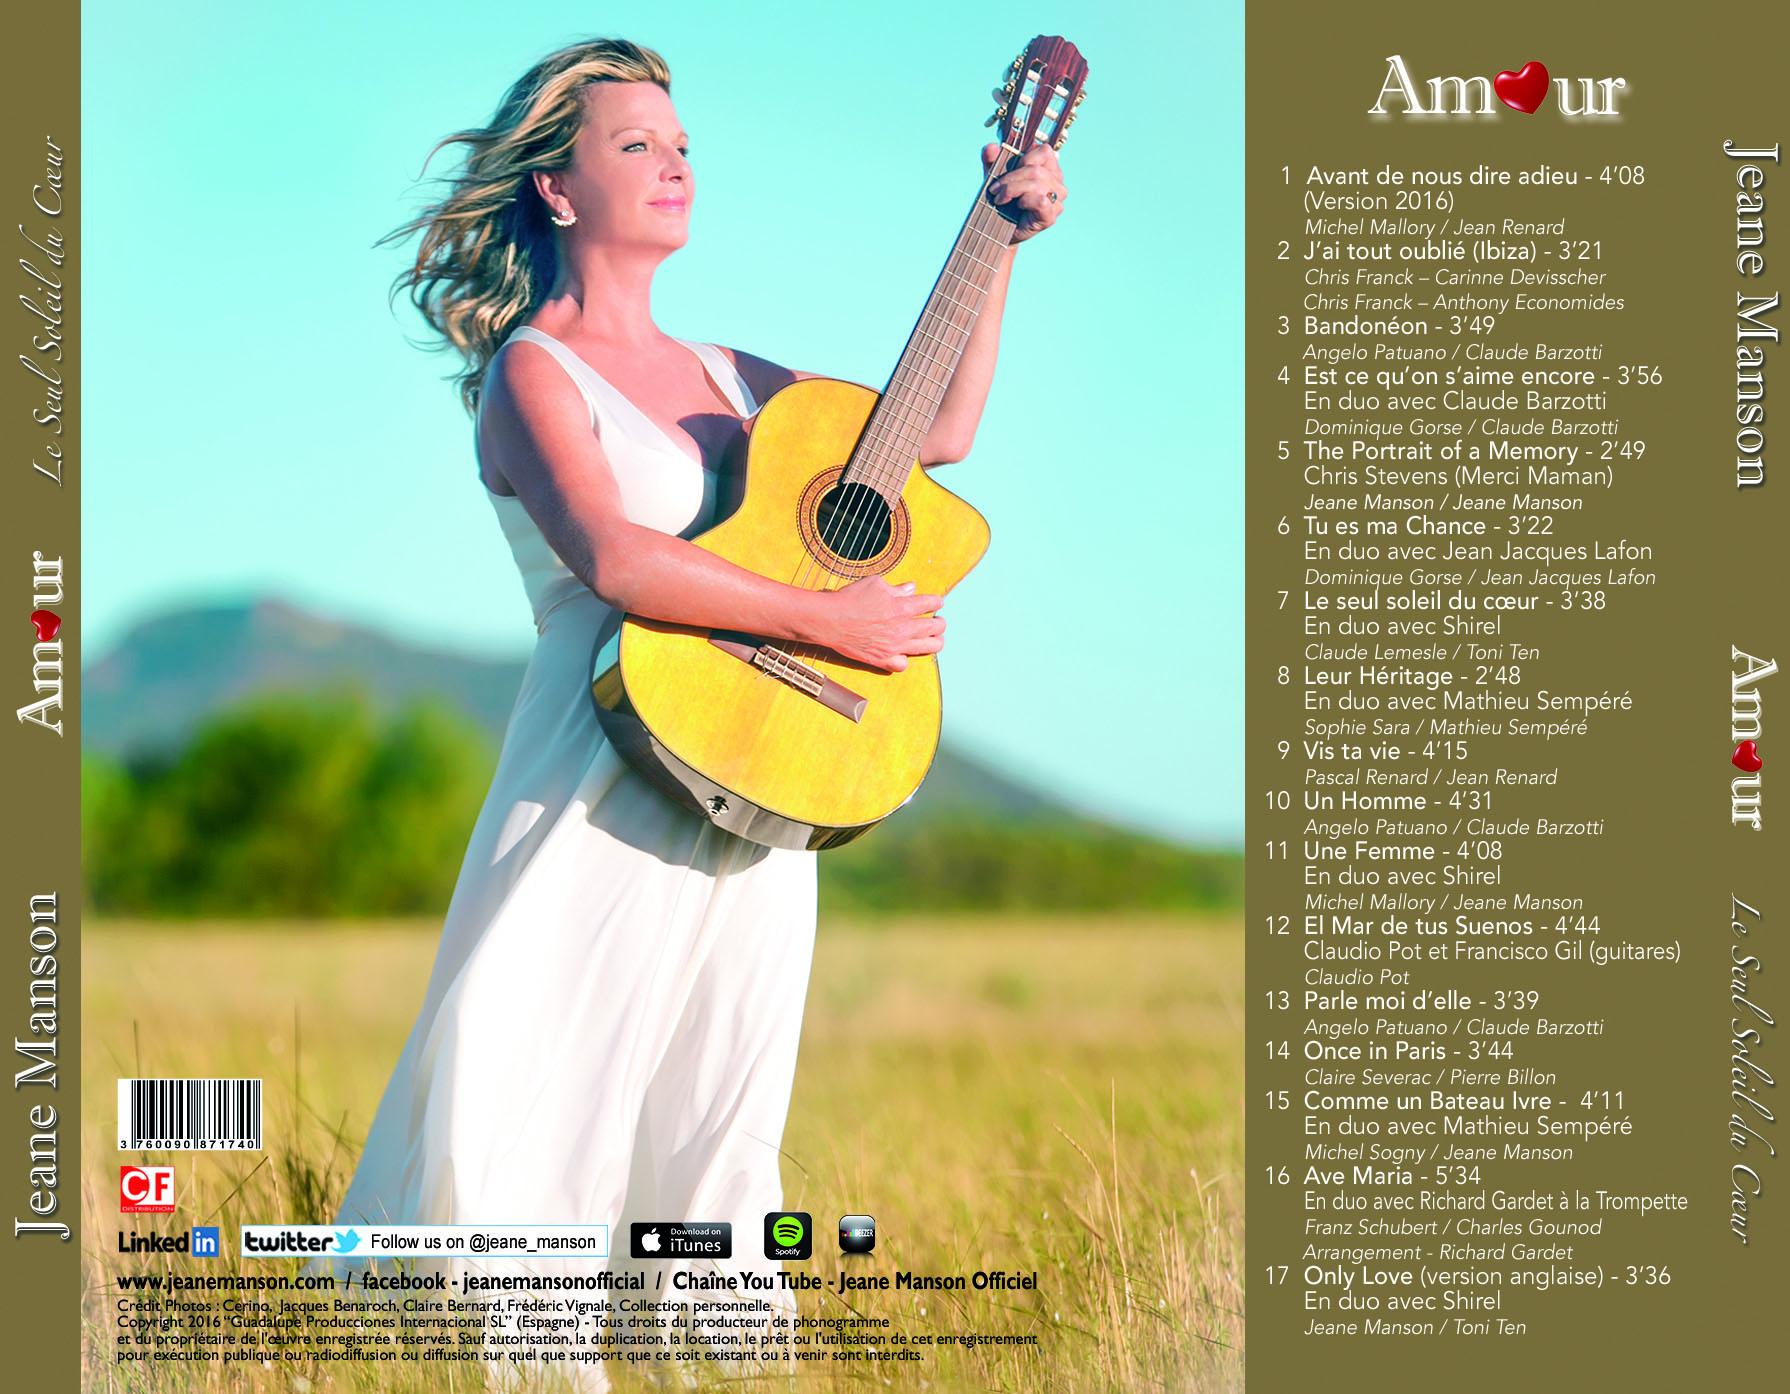 Verso 2 cd amour pour site